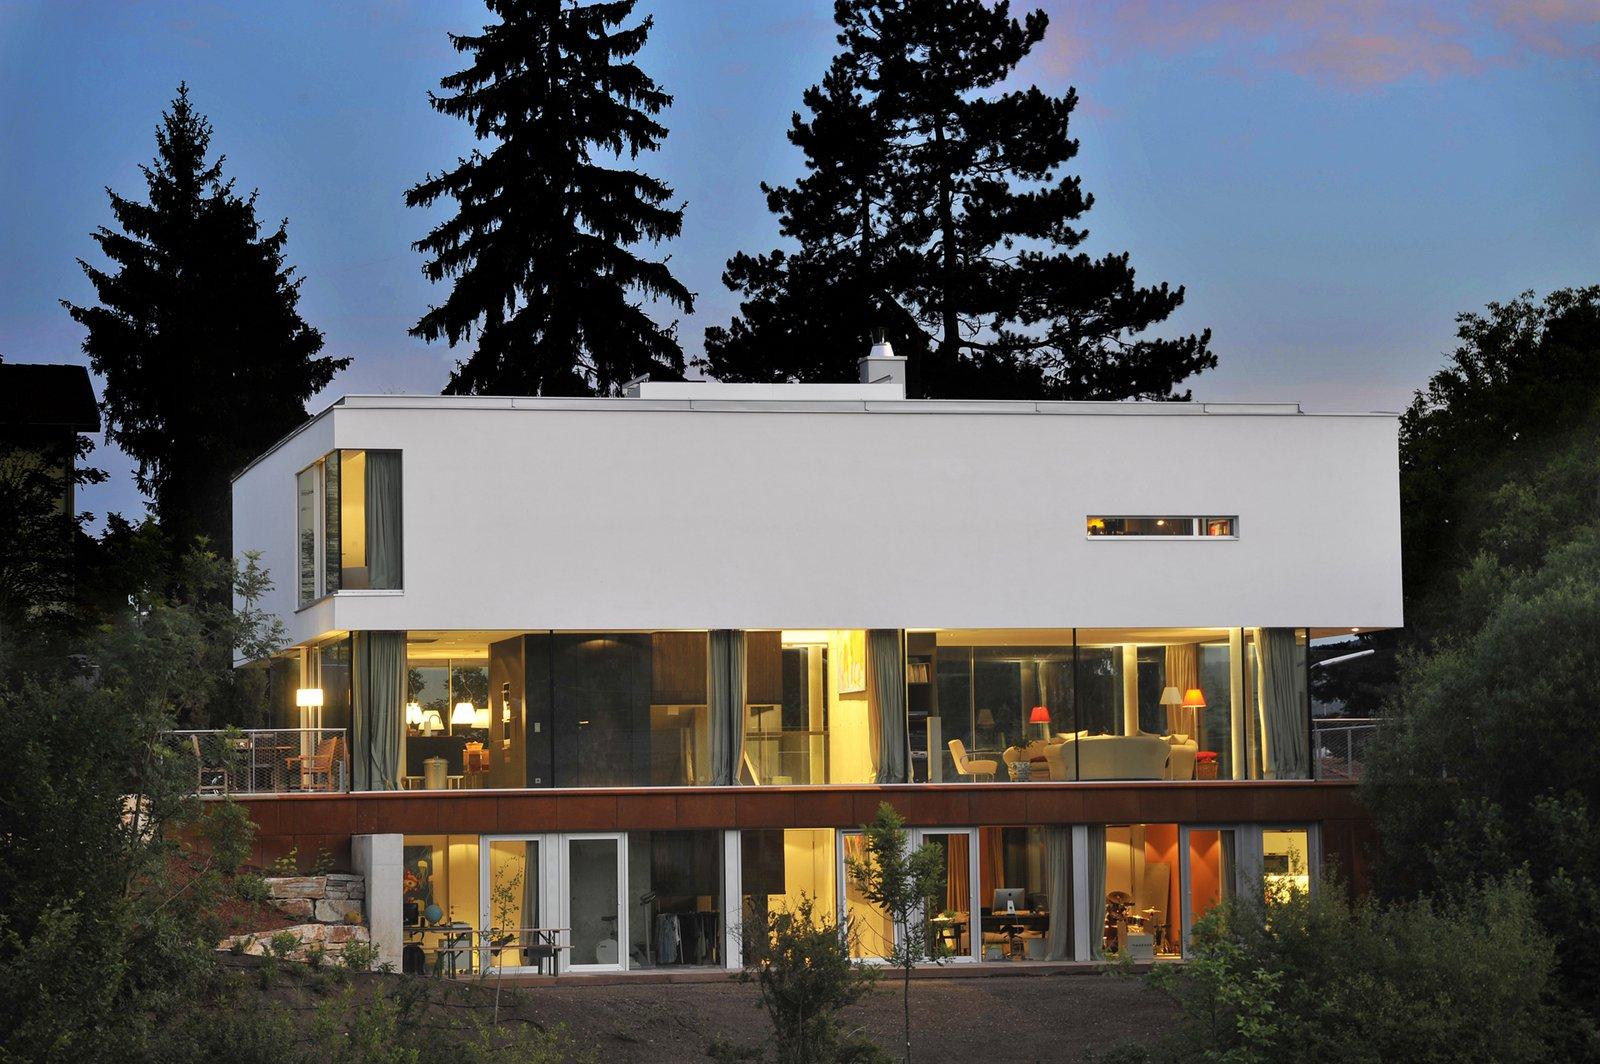 North view in the evening  360° Villa by Architect Zoran Bodrozic